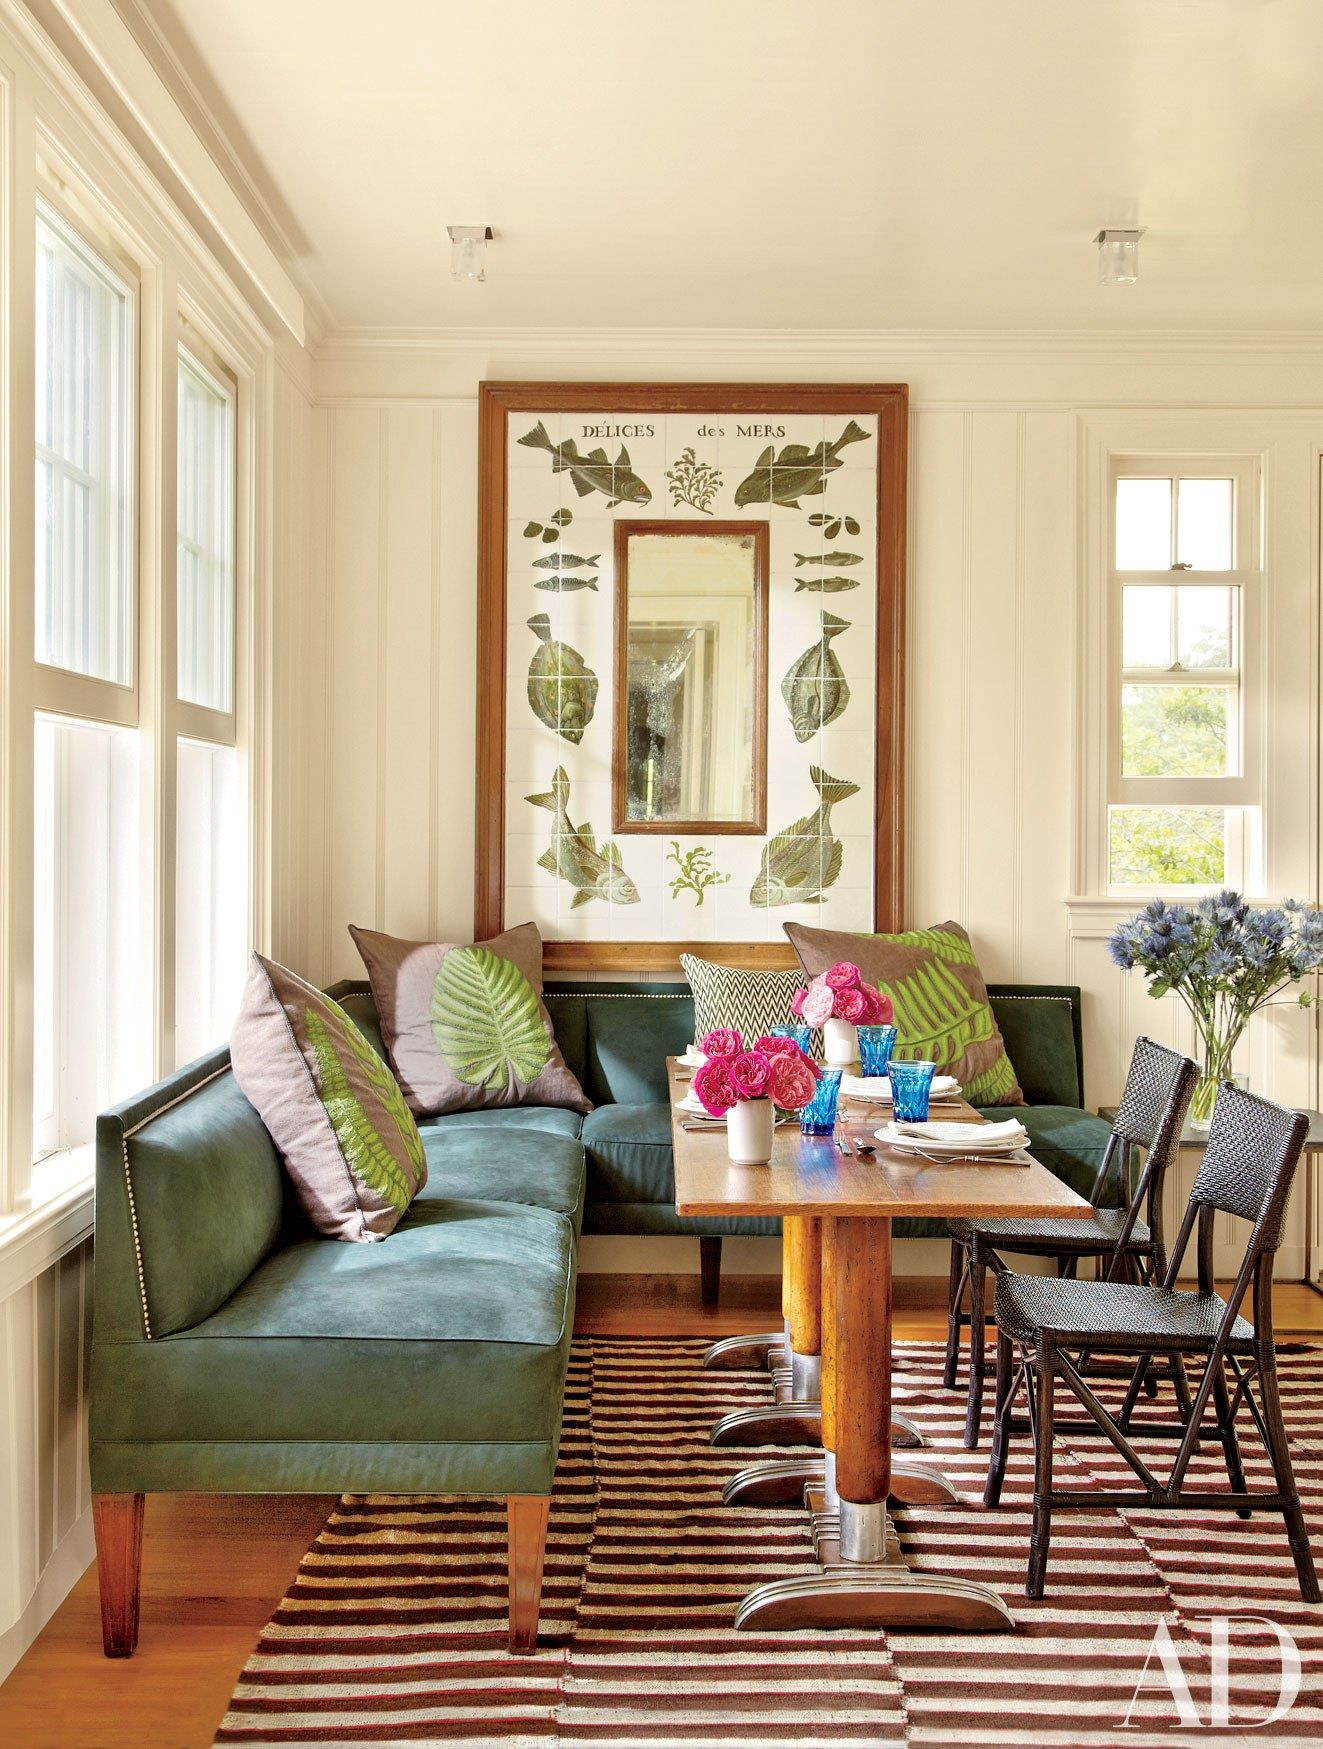 19 Family-Friendly Kitchen Design Ideas | Interiores